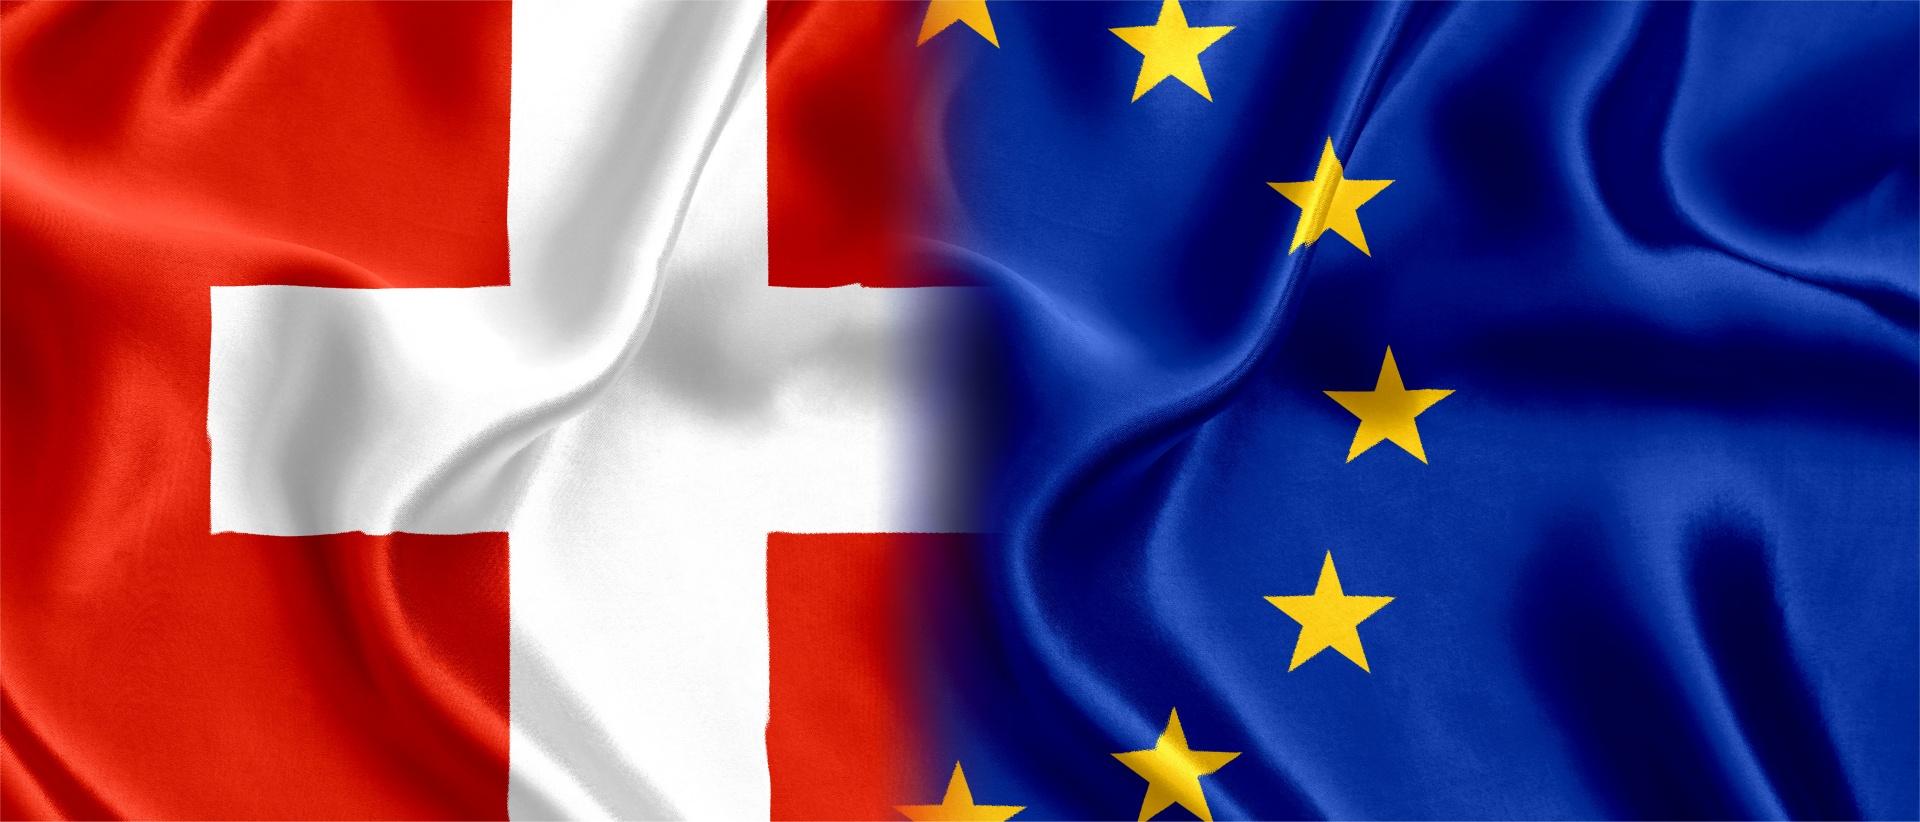 EU-Kommission-kritisiert-unwilligen-Bundesrat-wegen-Rahmenabkommen